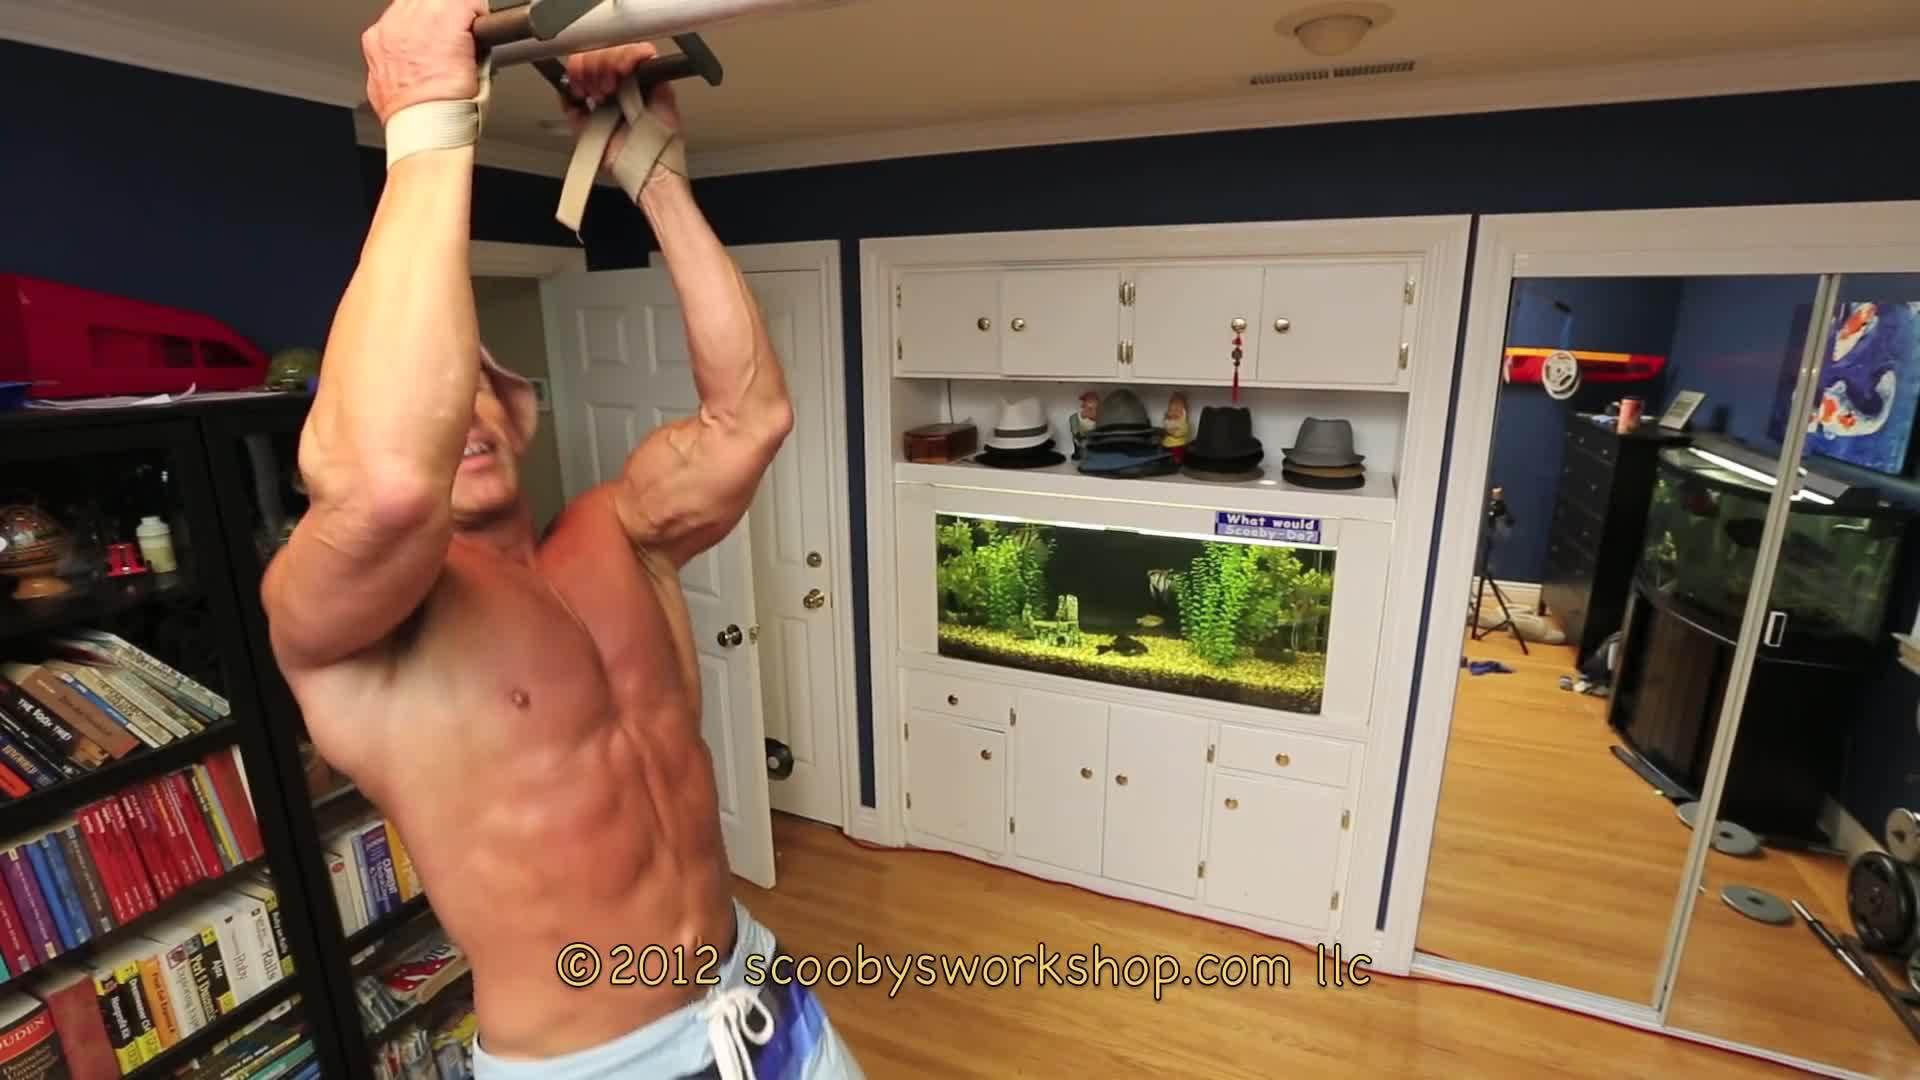 bodybuilder, bodybuilding, home, Narrow grip pullups - best bodyweight exercise GIFs